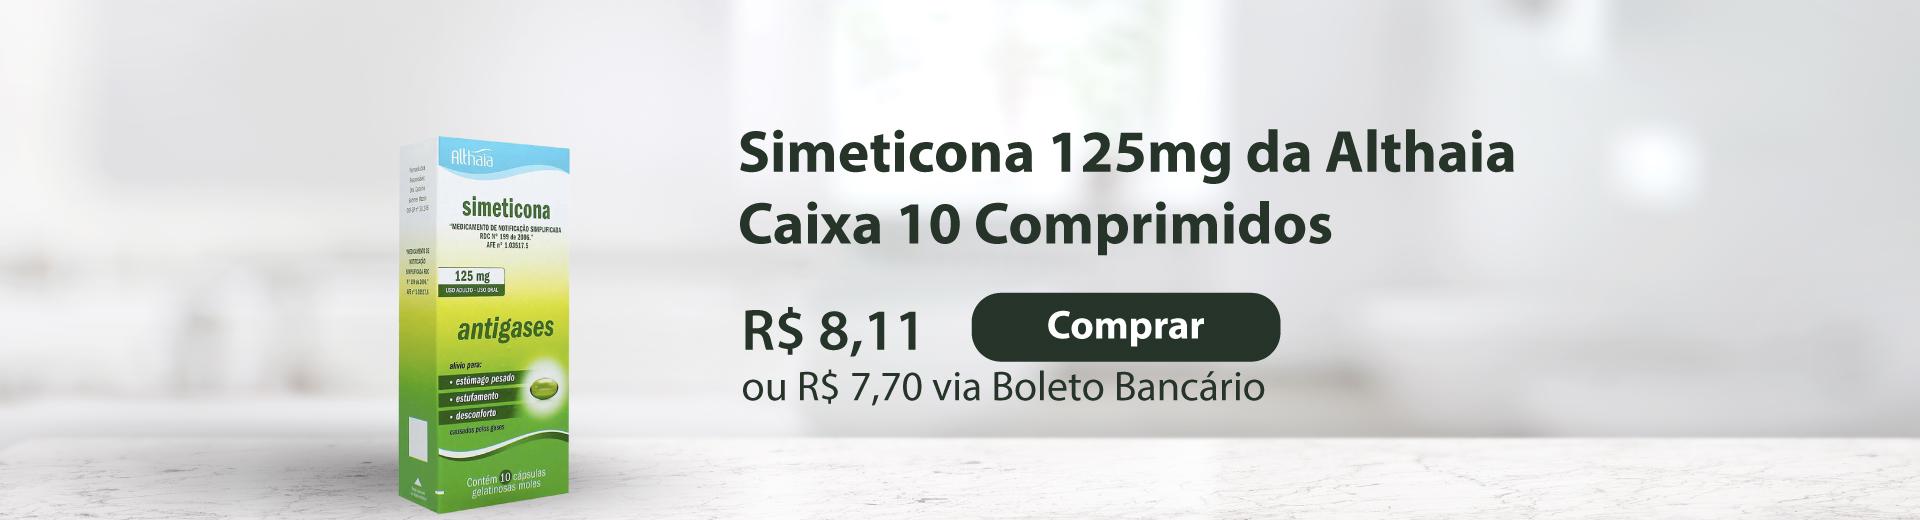 Simeticona